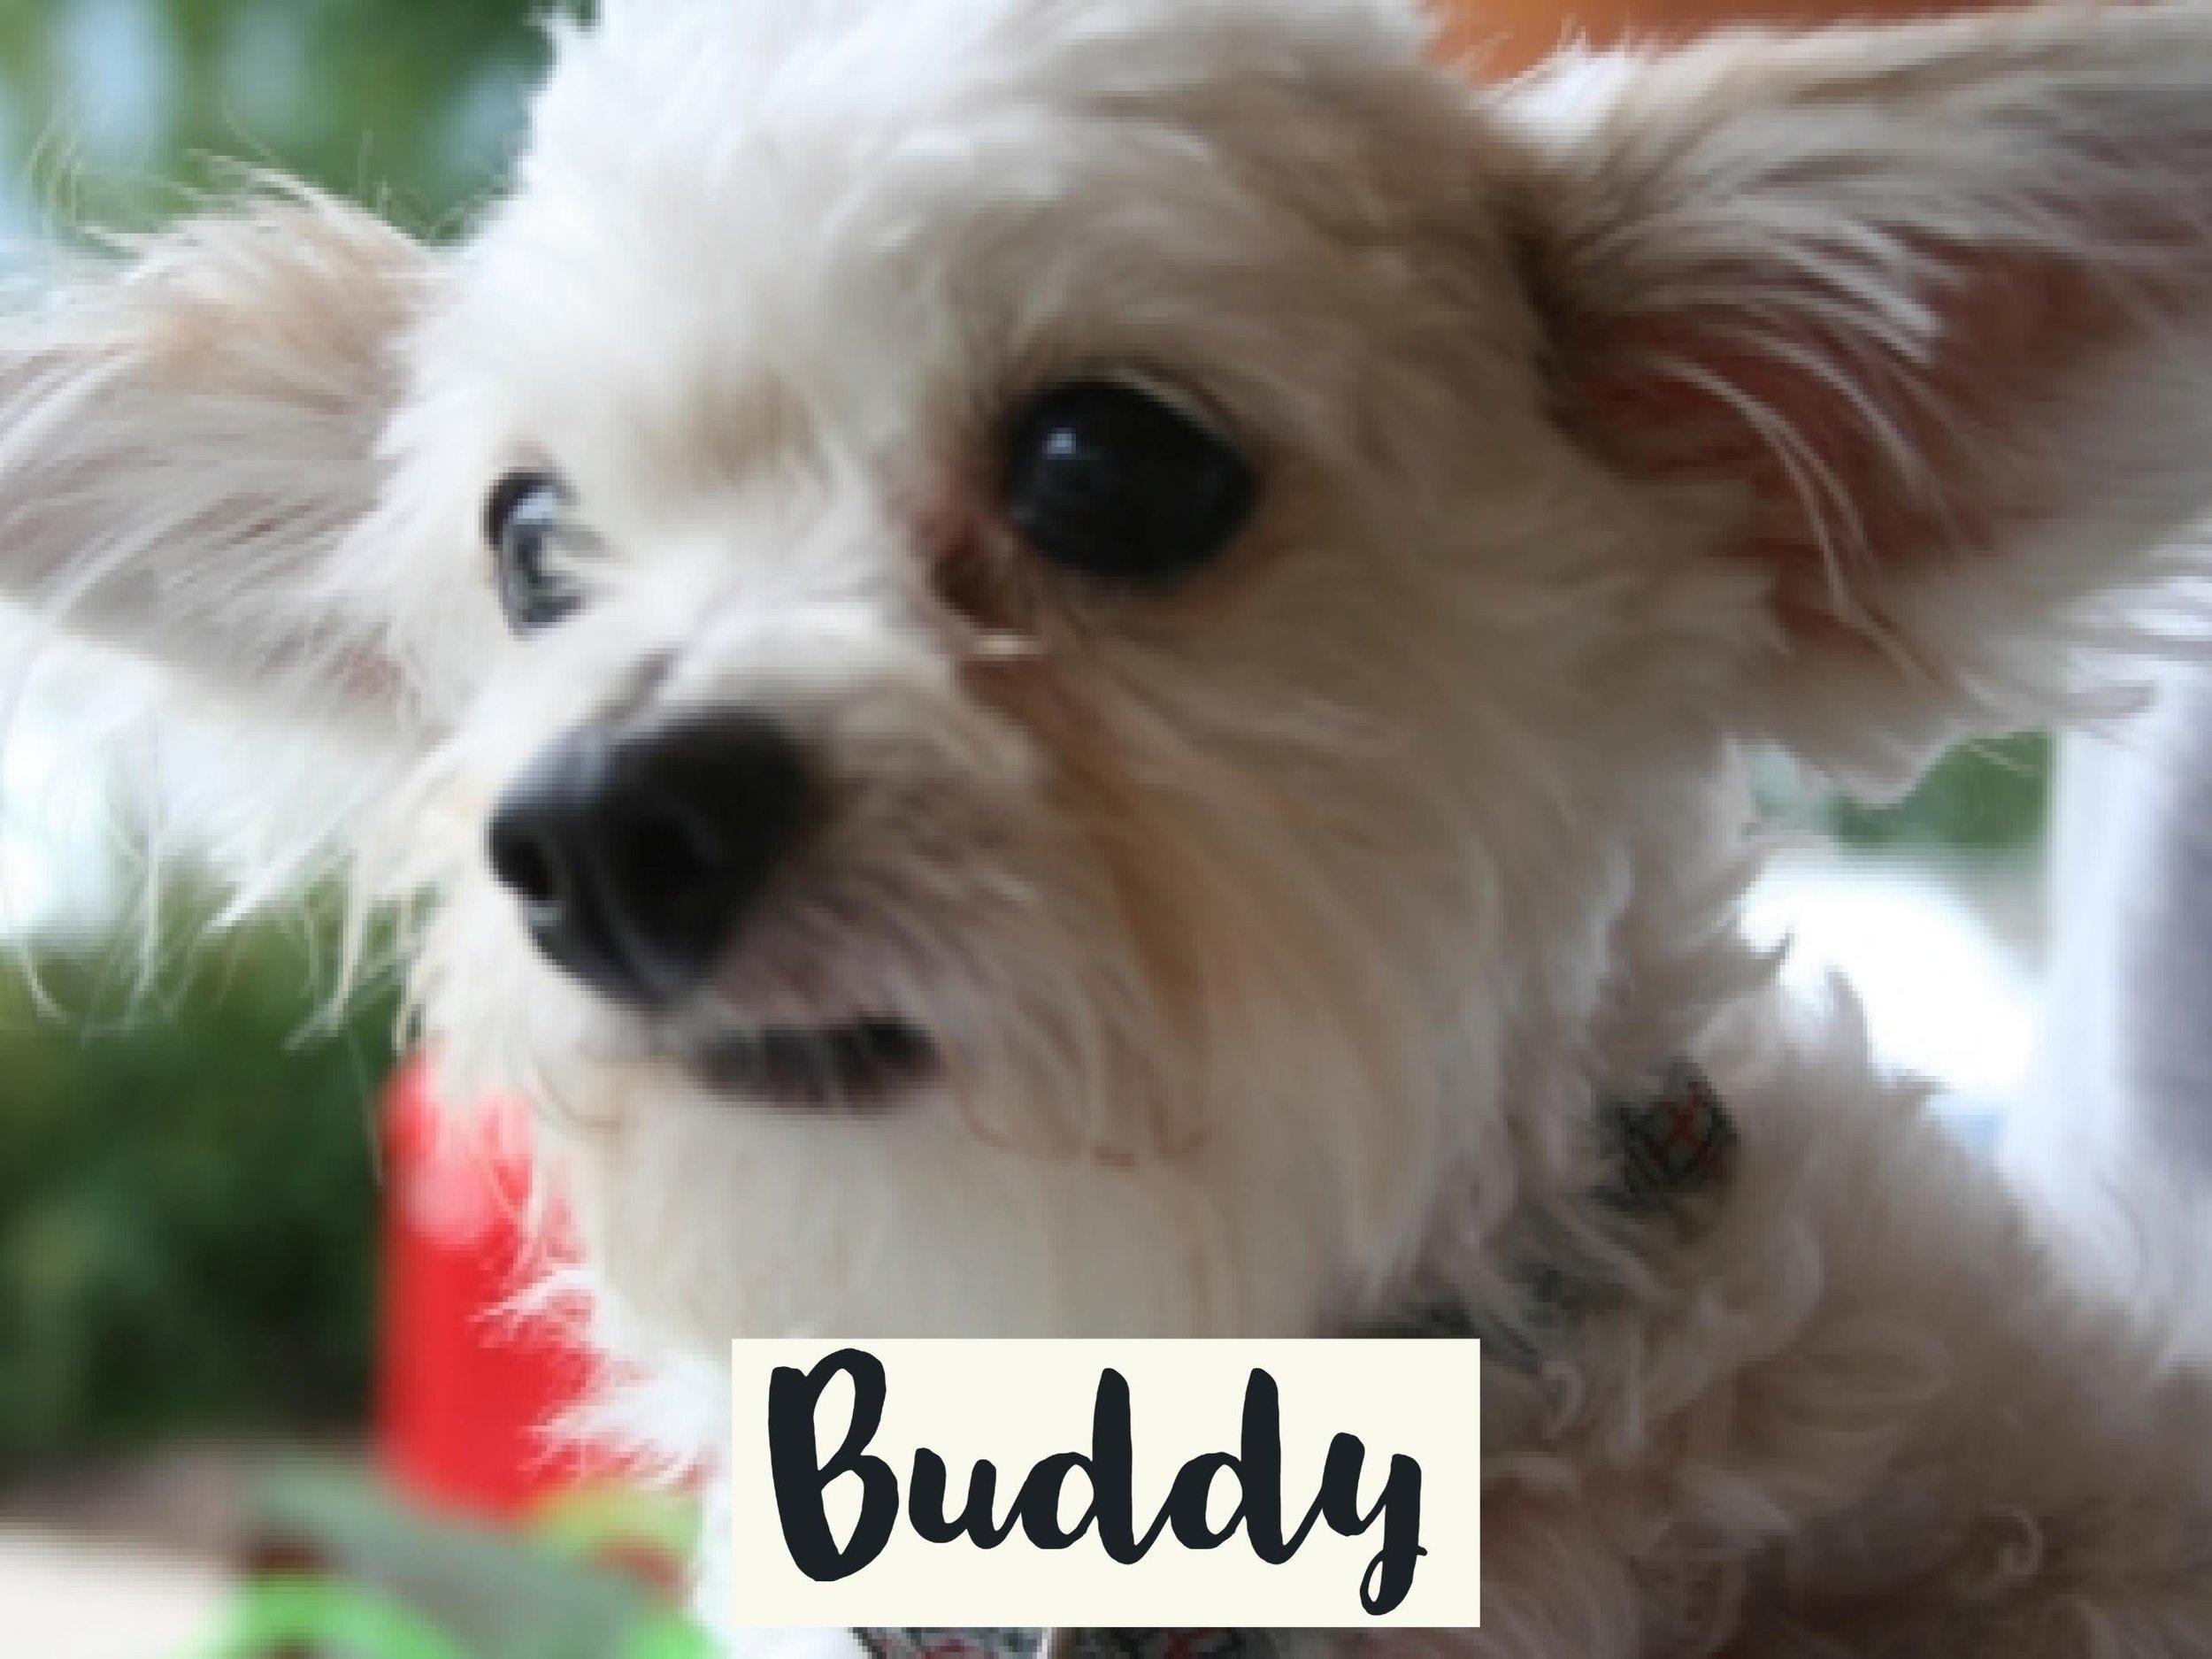 Buddy_2WV17.jpg